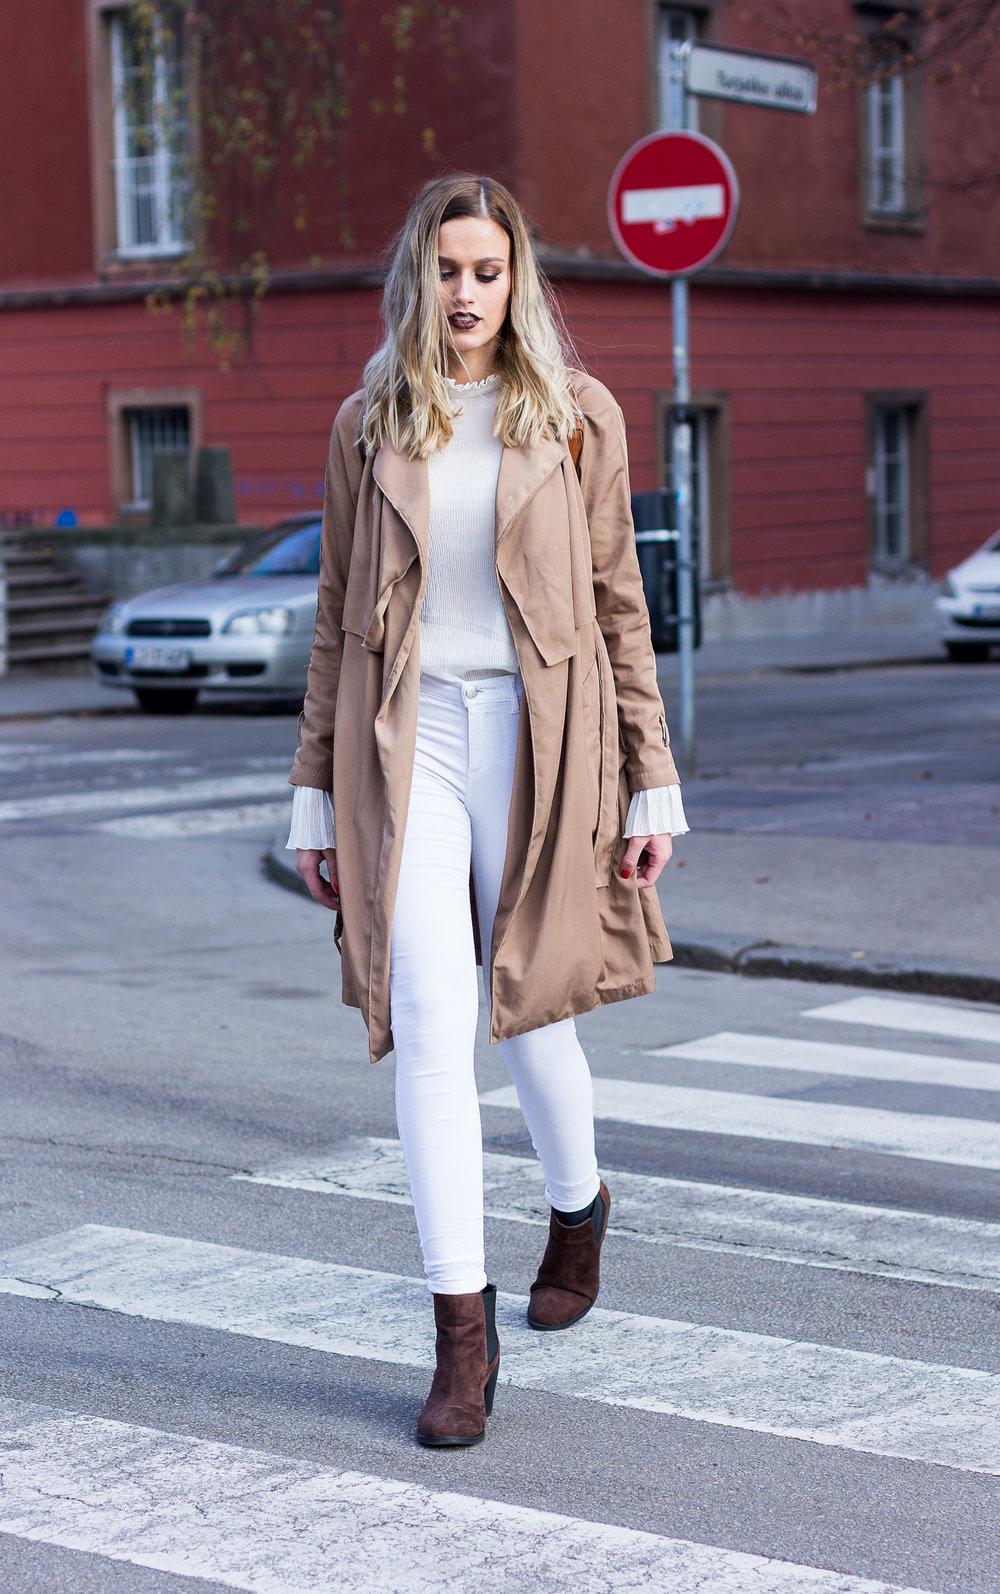 street style mainstreamchic boo